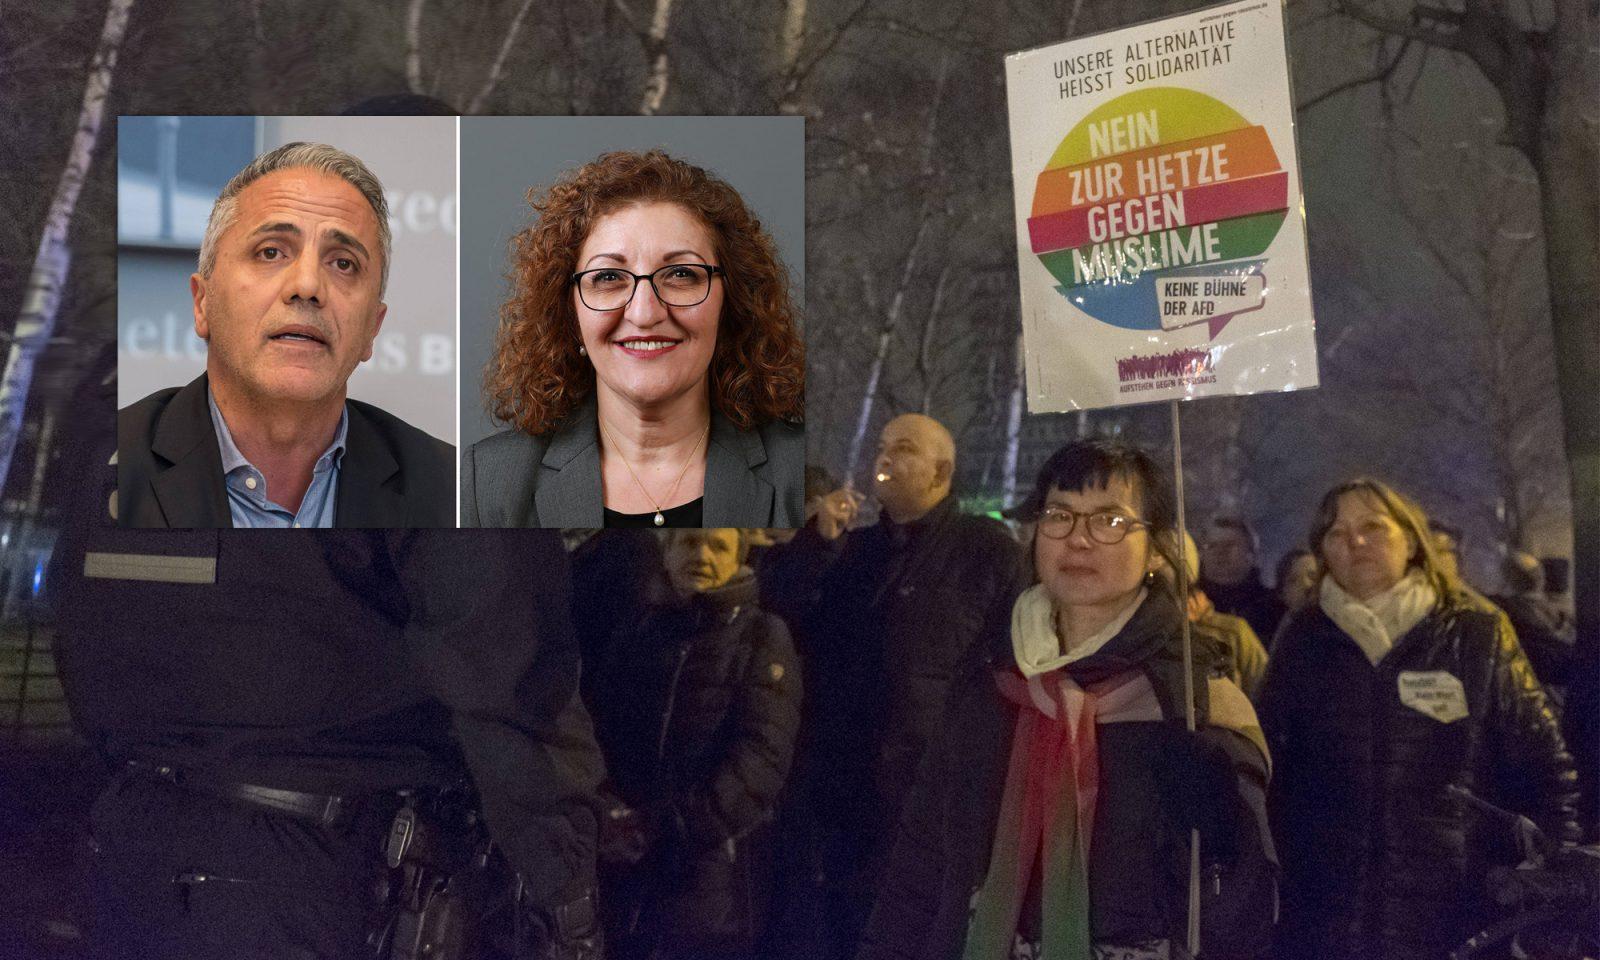 Hakan Taş (Linkspartei, l.) und Fatoş Topaç (Grüne), Kundgebung gegen Frauendemo 2018 in Berlin